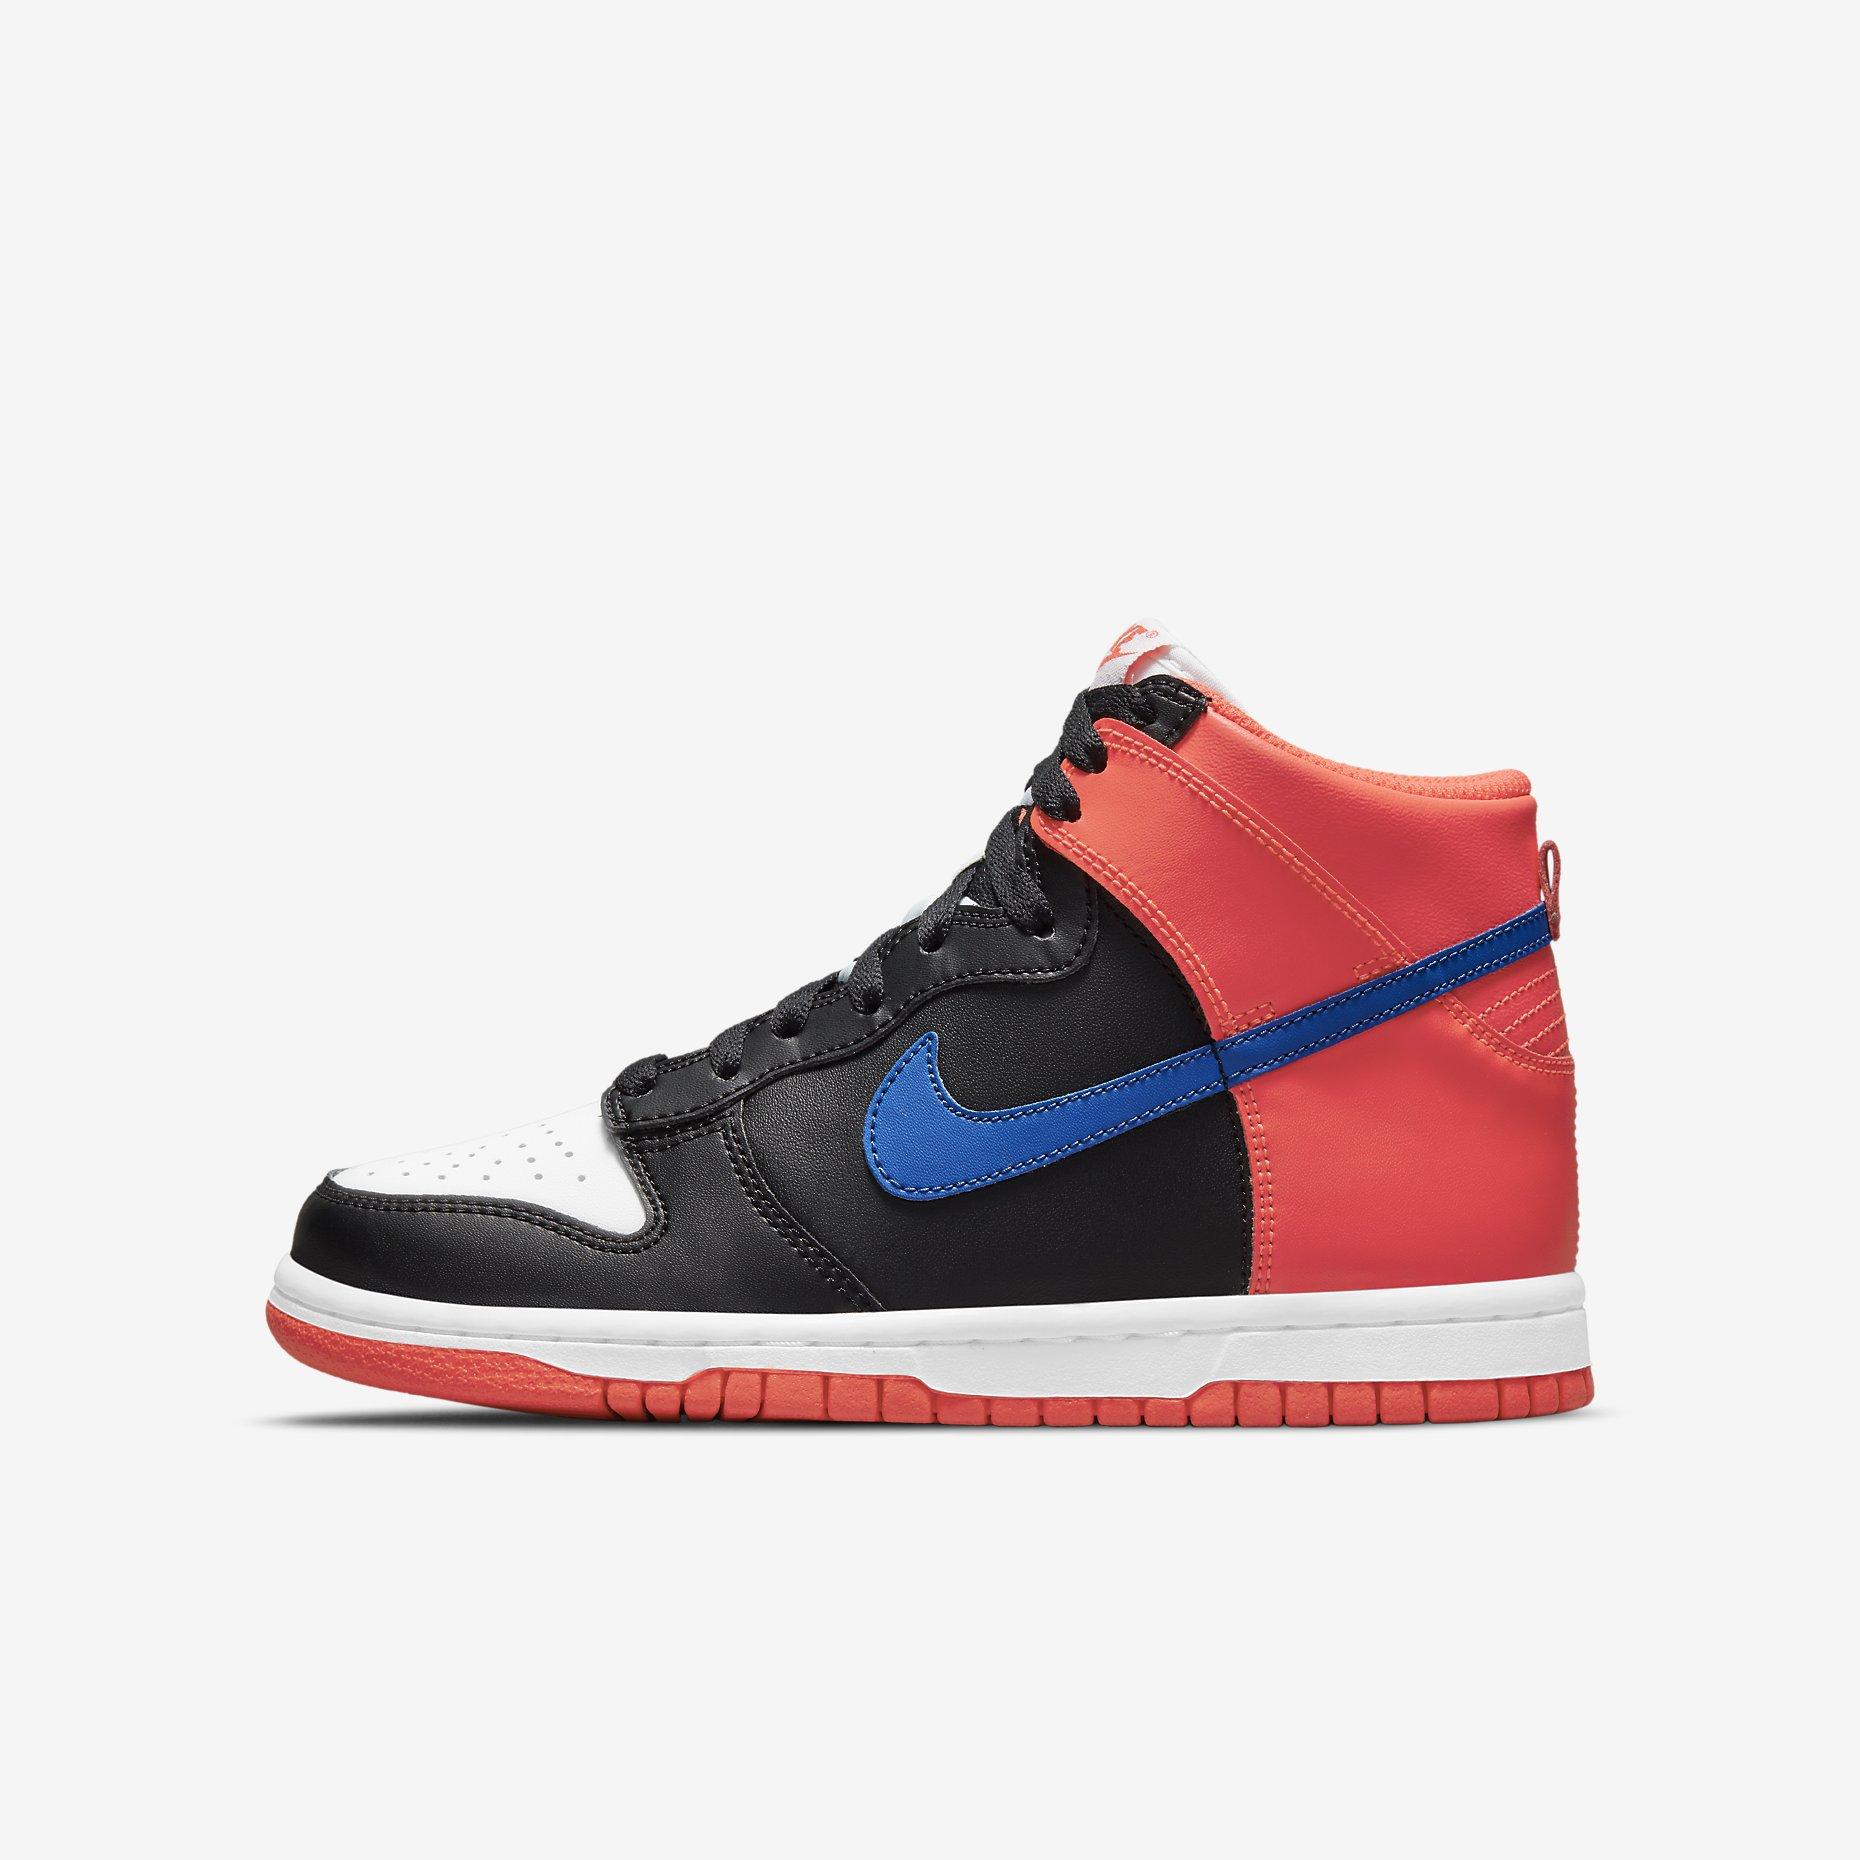 Nike Dunk High GS 'Black/Bright Crimson' - Knicks